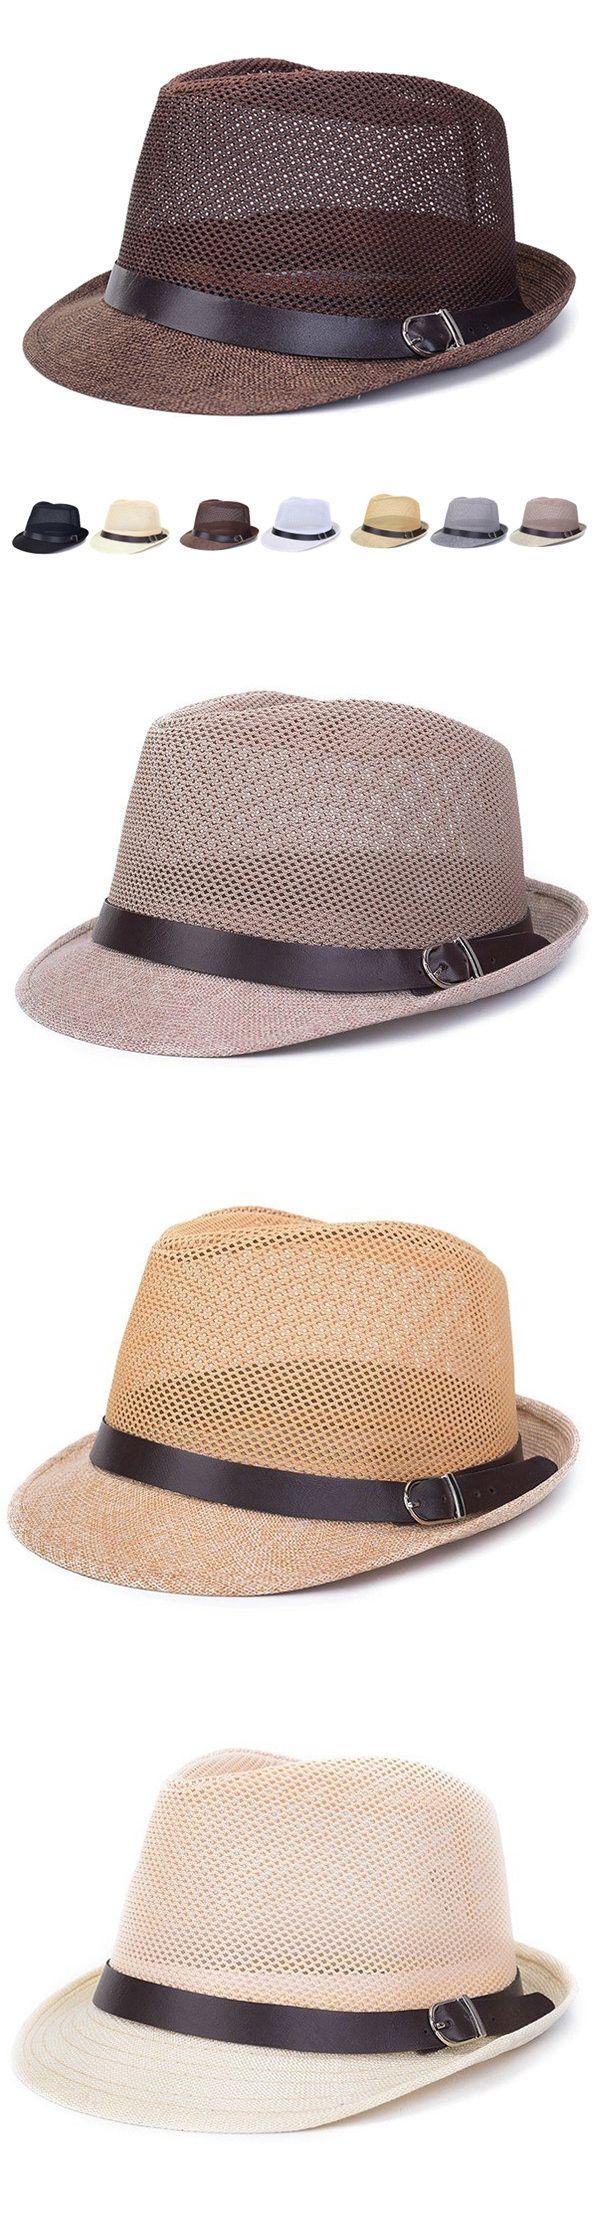 Men Women Hollow Out Mesh Top Hat Casual Braid Fedora Beach Sun Flax Panama Jazz Hat